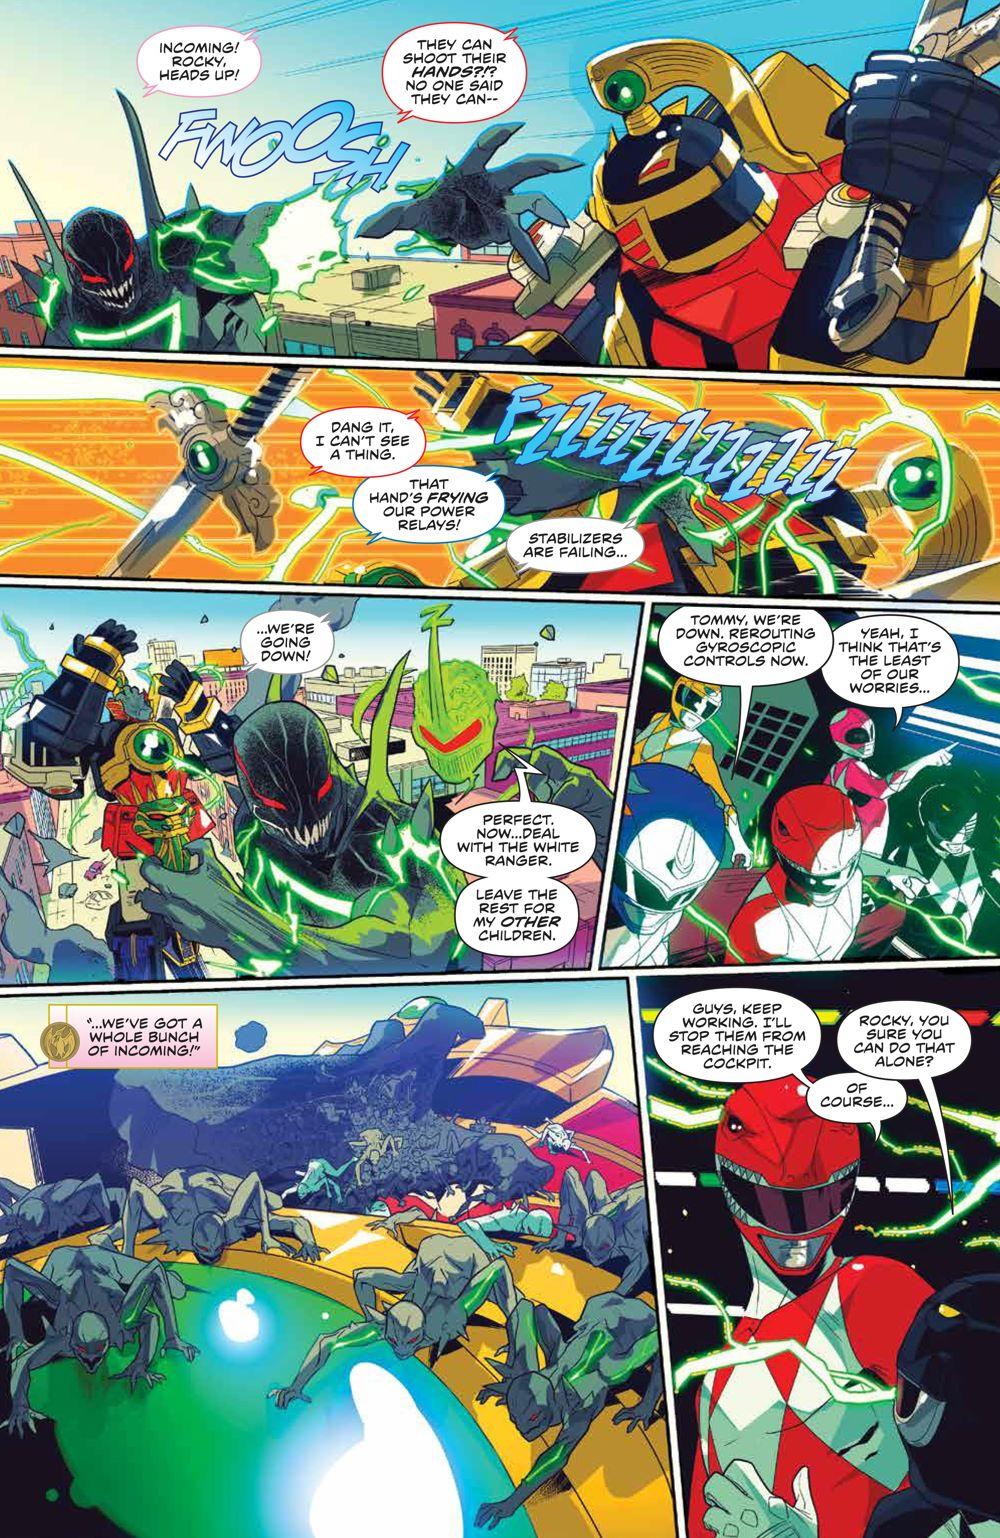 MightyMorphin_004_PRESS_7 ComicList Previews: MIGHTY MORPHIN #4